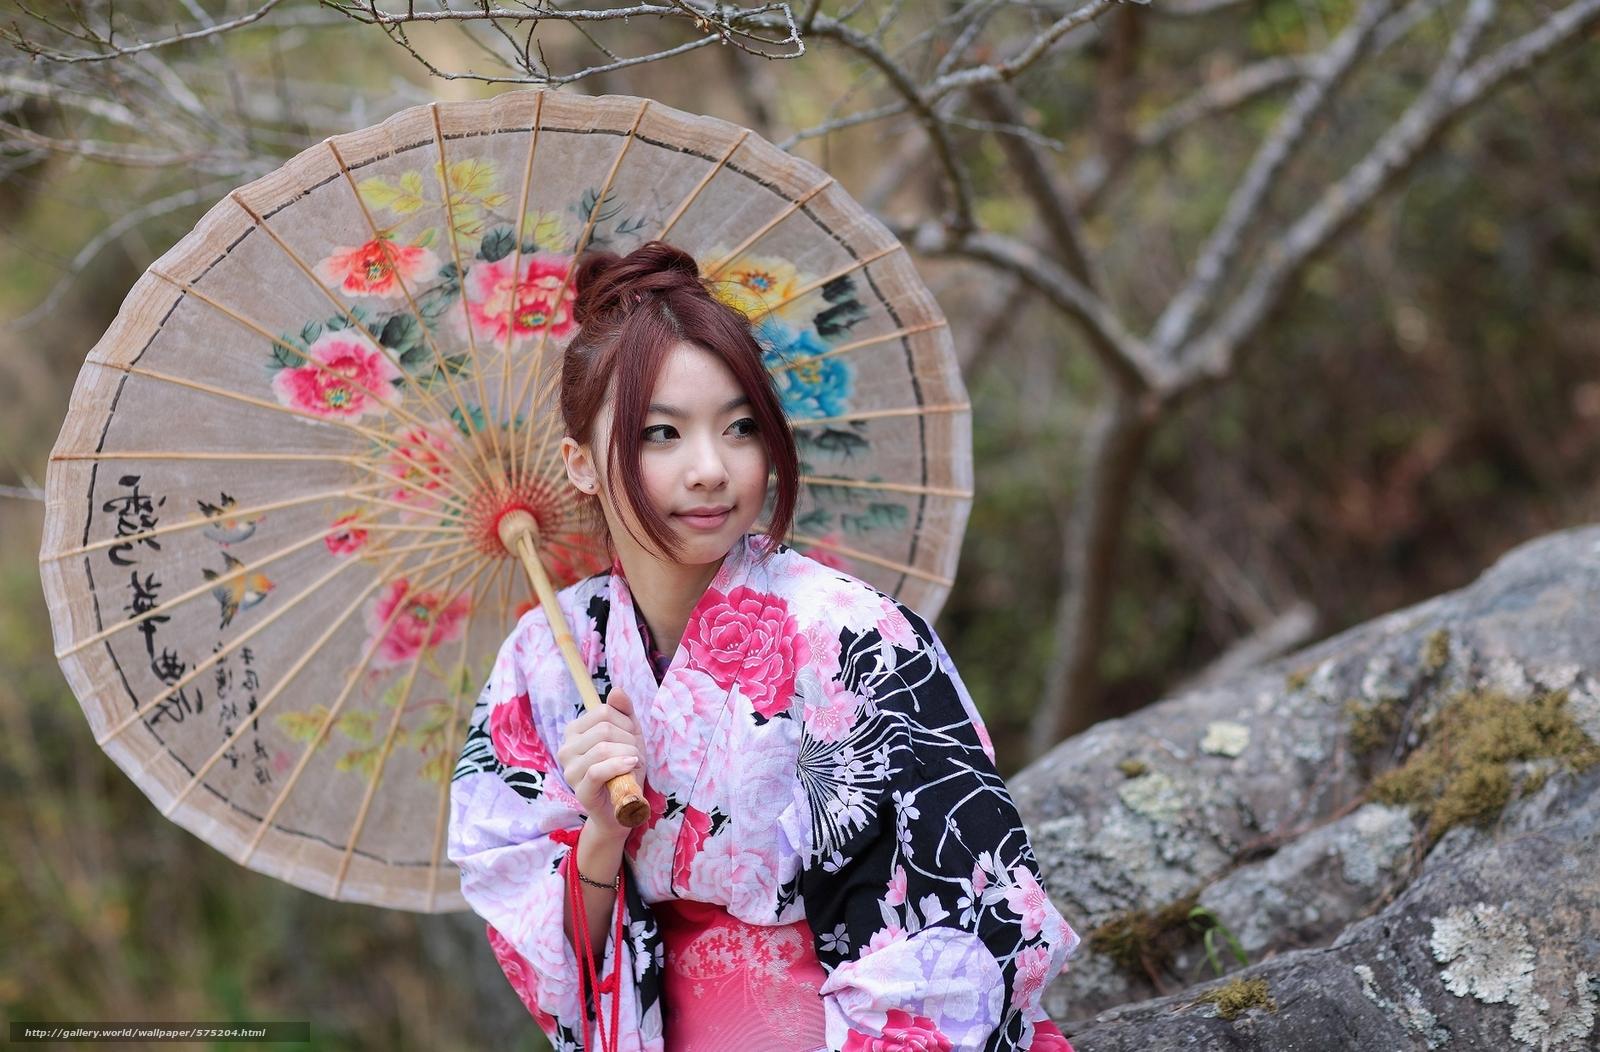 Азиатки бесплатно онлайн 13 фотография